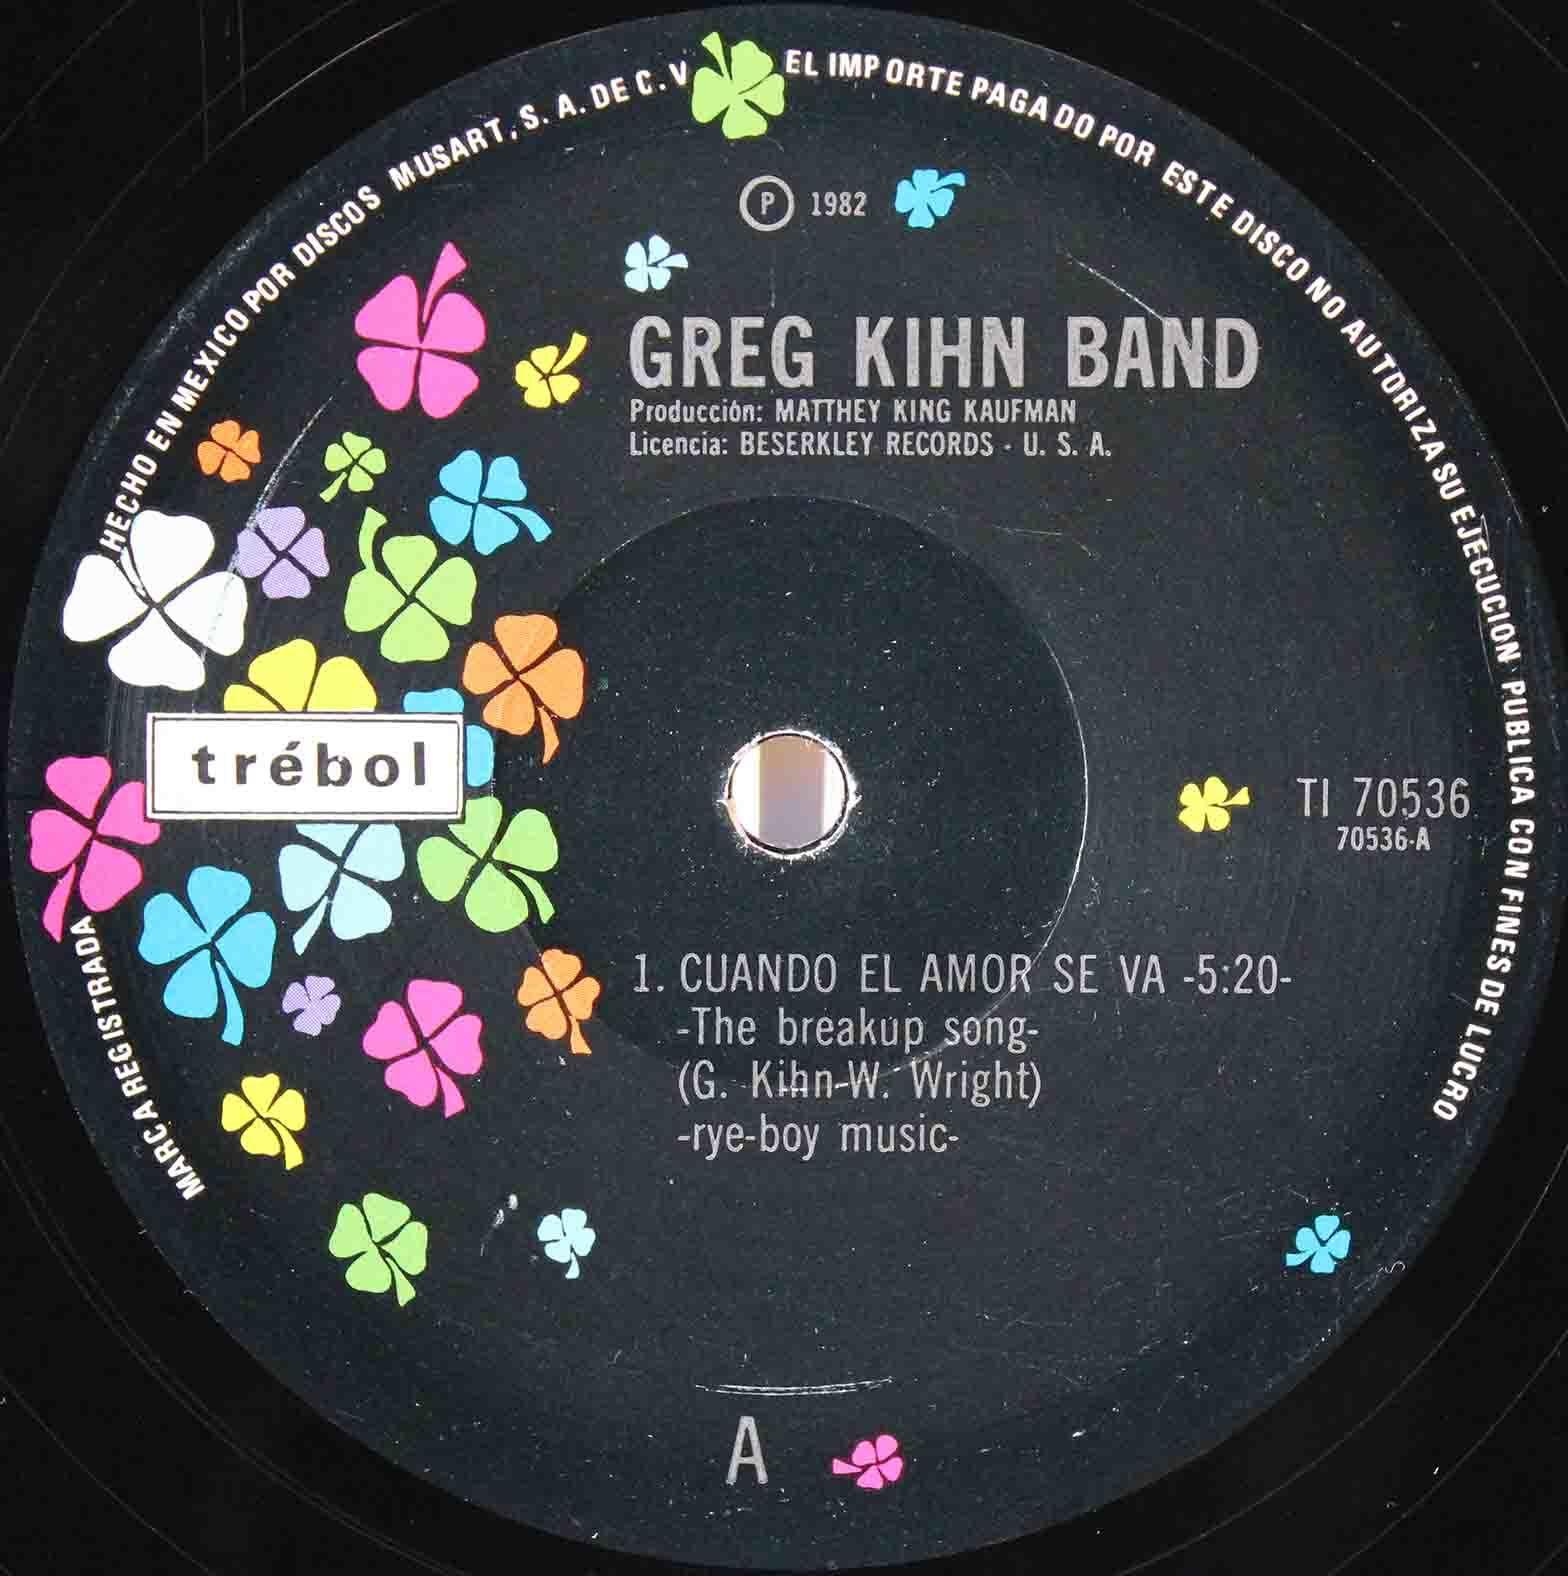 Greg Kihn Band – The Breakup Song 03